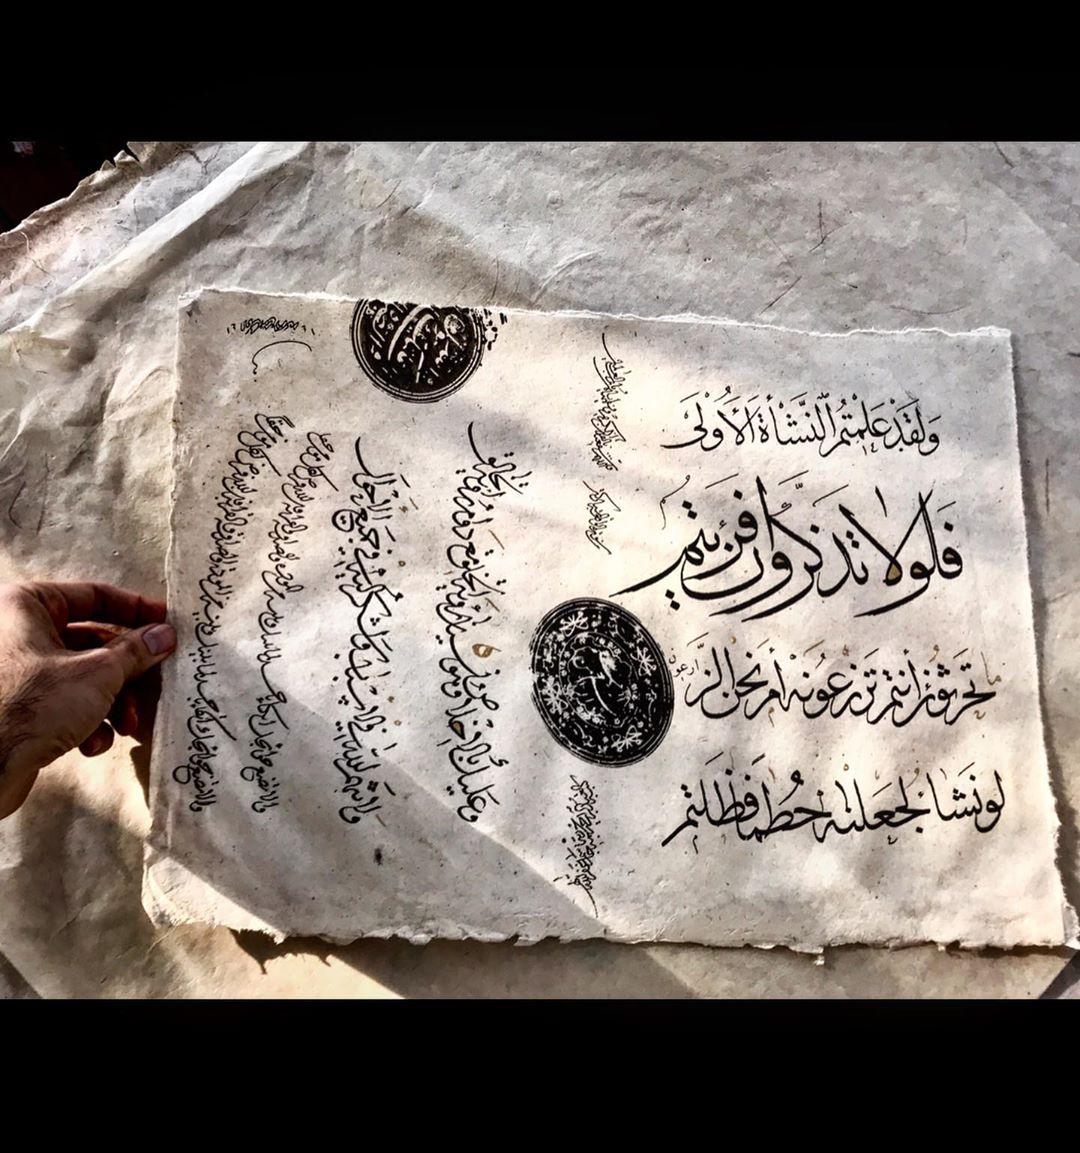 Karya Kaligrafi هذه احدى لوحات معرض سيتم الاعلان عنه قريباً ترقبوا  #خط #خطوط #خواطر #خط_عربي #…- jasssim Meraj